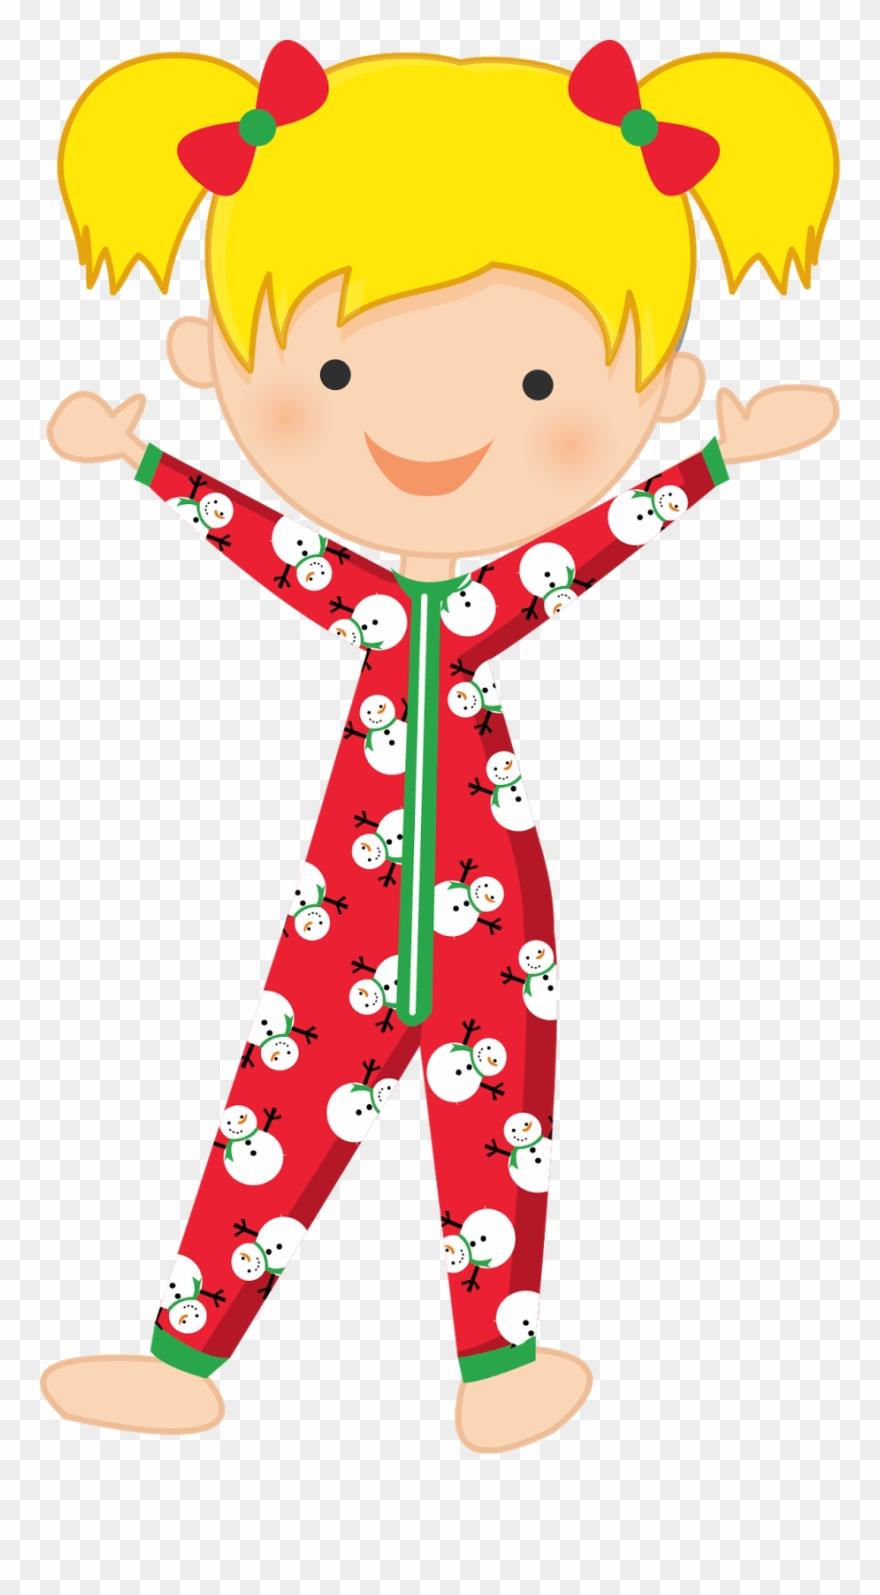 Christmas png download pinclipart. Pajamas clipart red pajamas